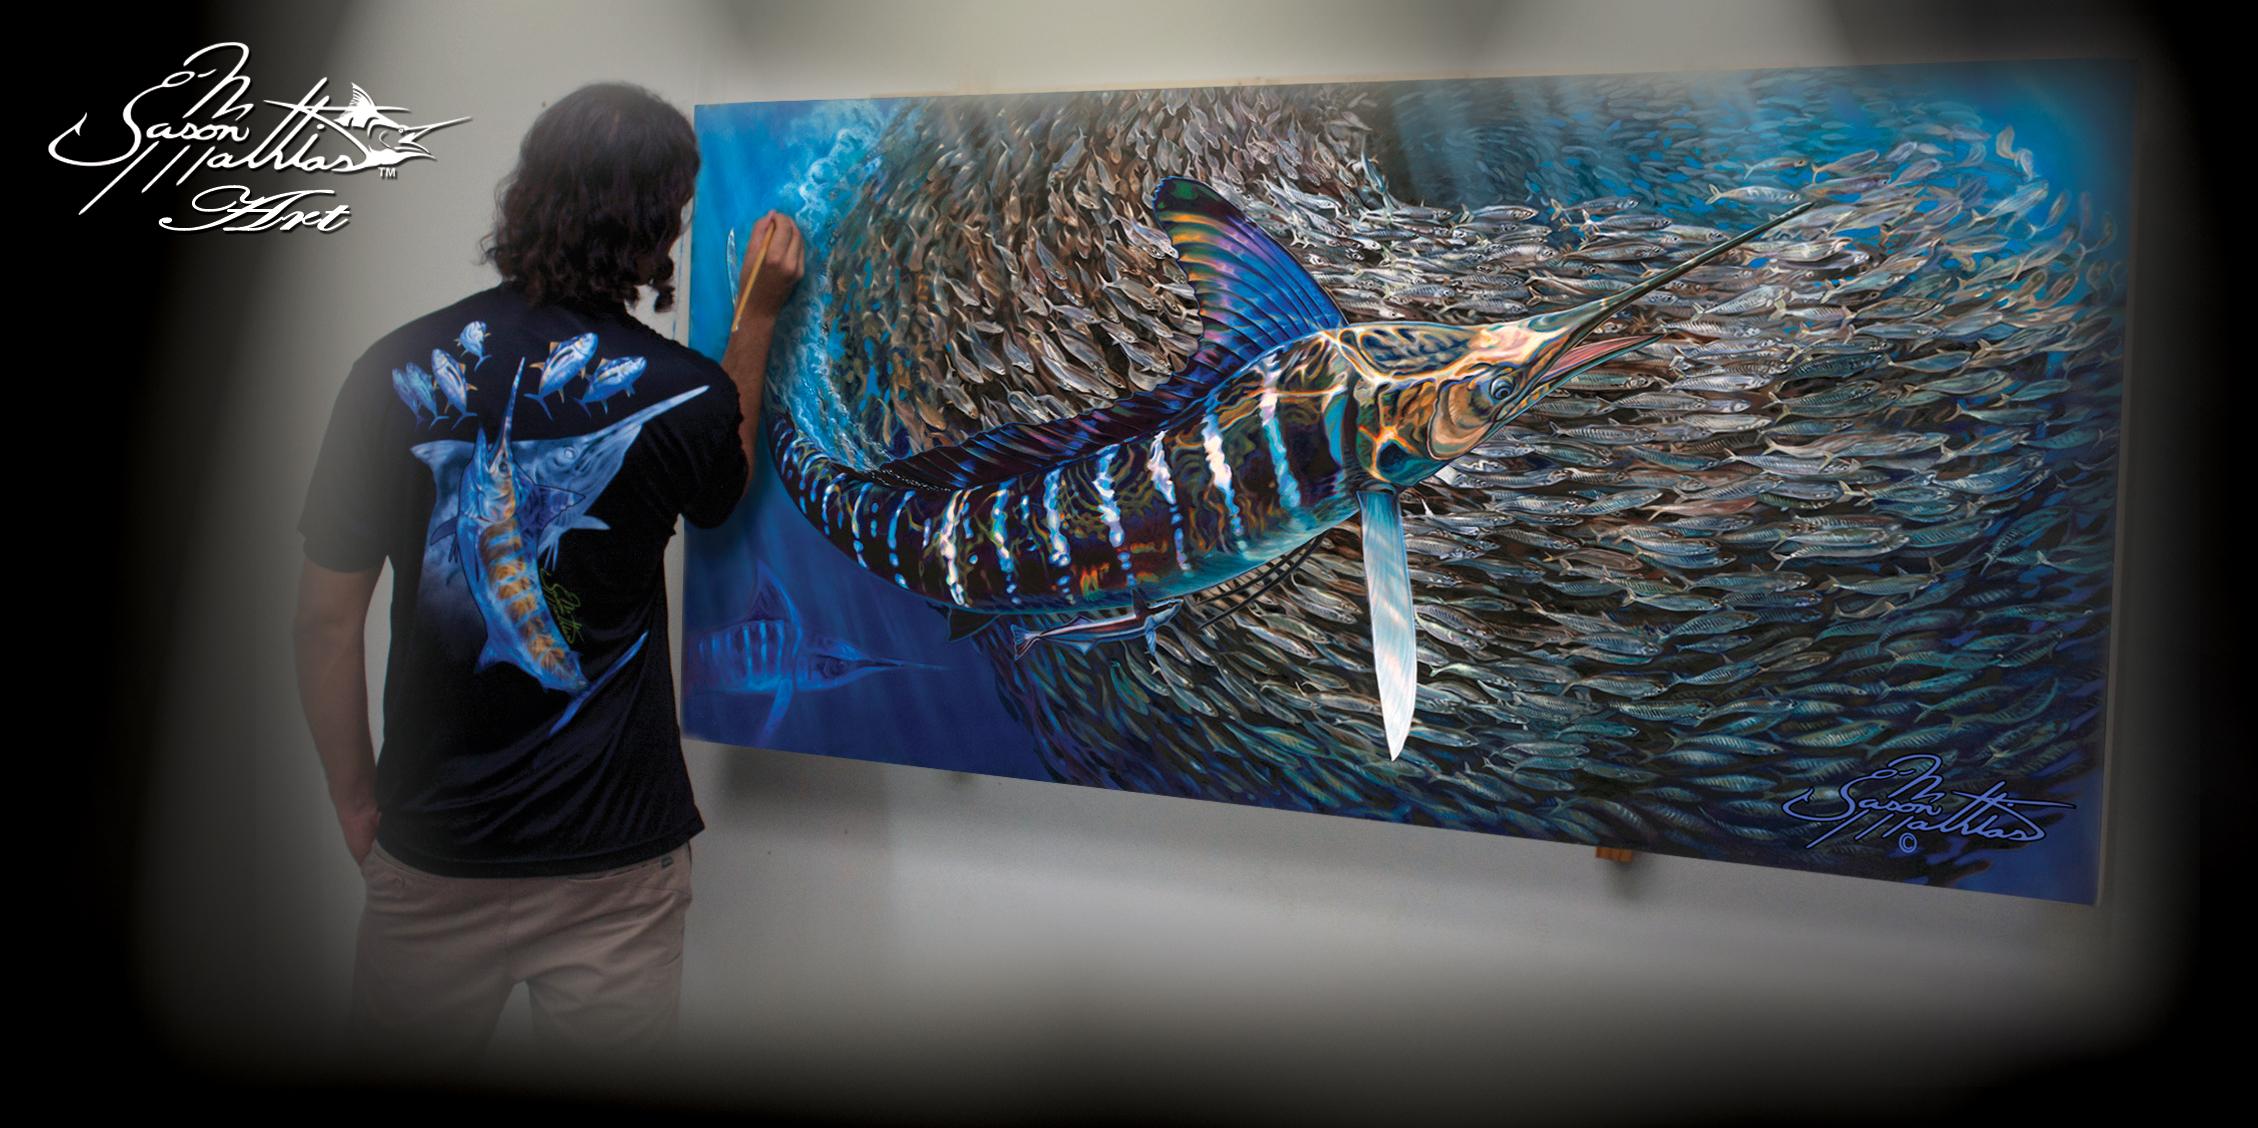 jason mathias, gamefish, art, sportfish, sport fish, game fish, prints, originals, paintings, pictures